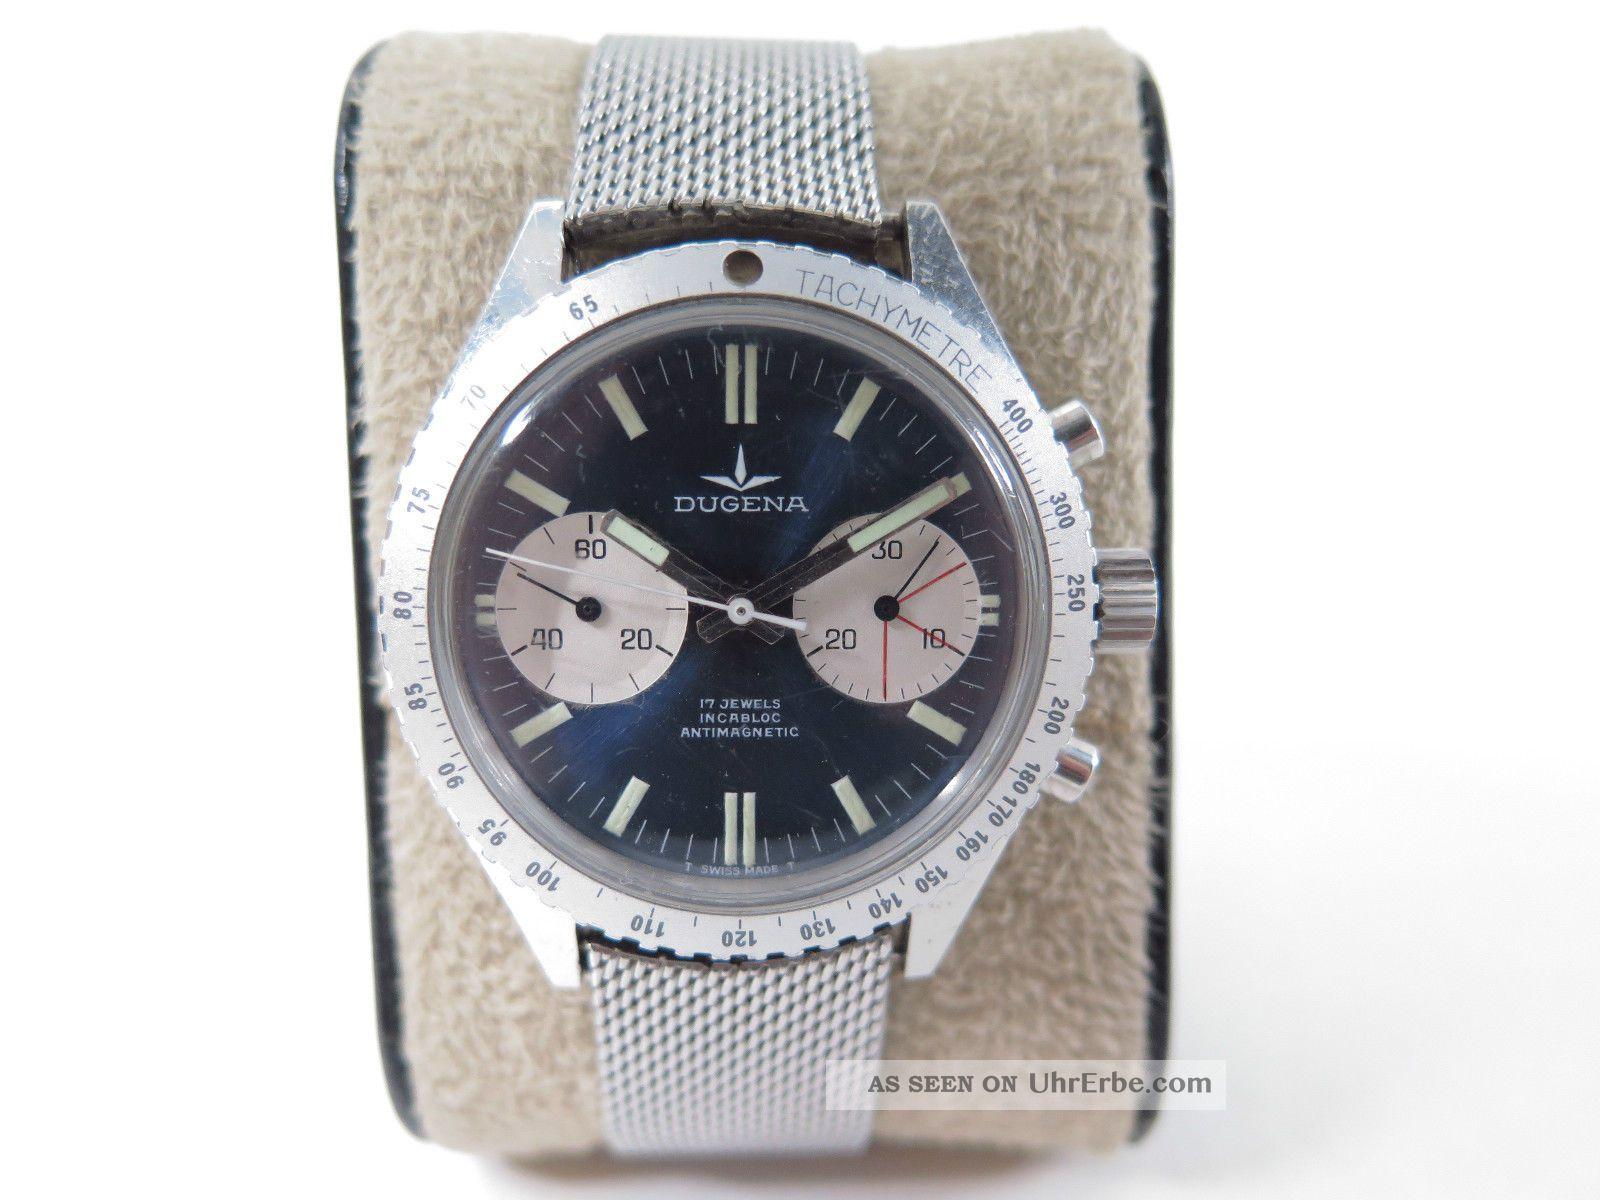 Dugena Chronograph Mit Valjoux 7733 Uhrwerk - Armbanduhr Armbanduhren Bild